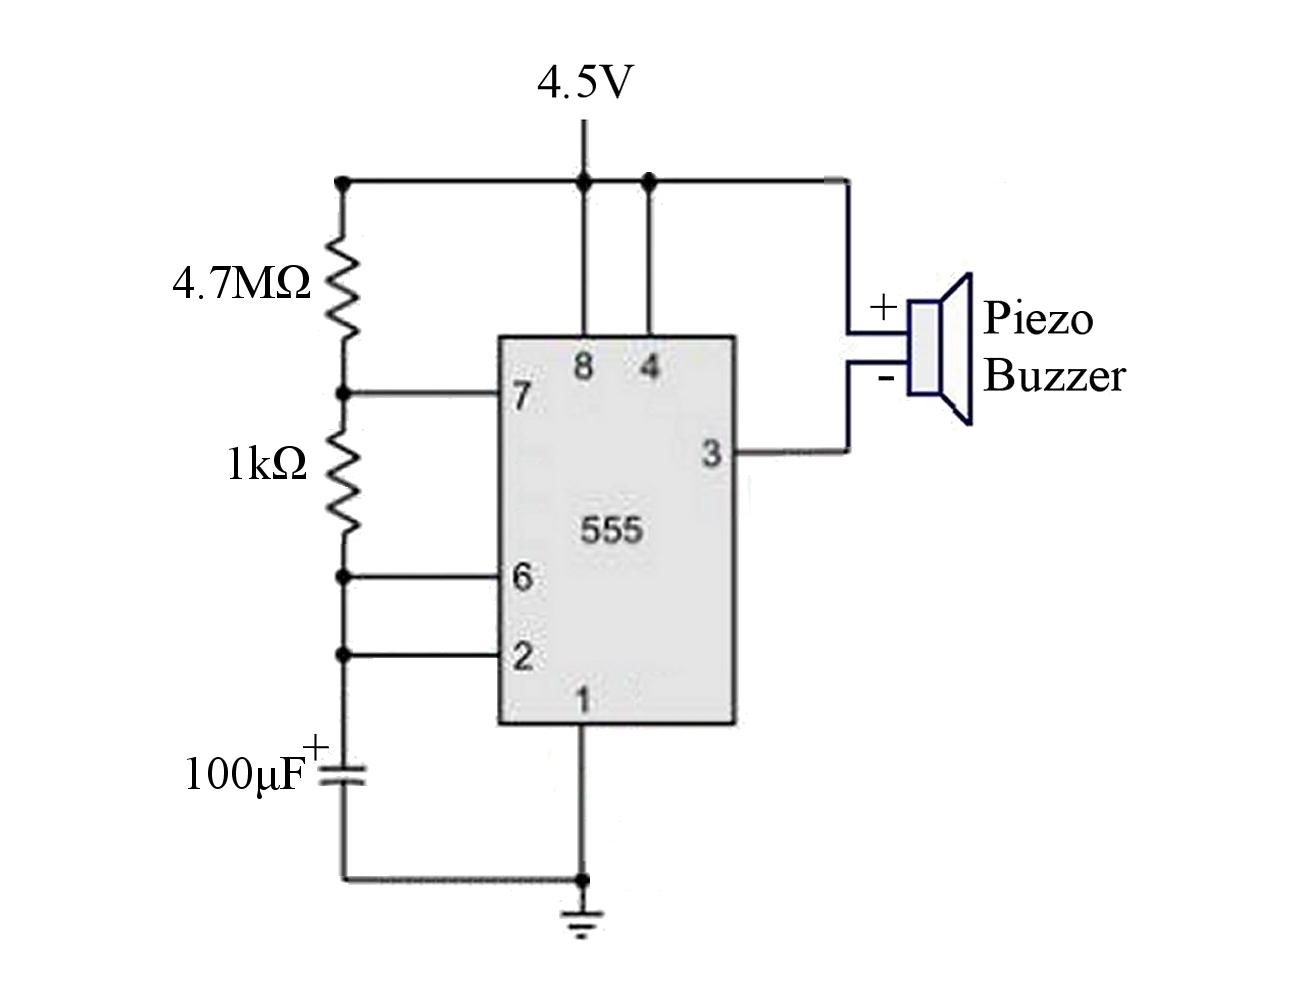 Ibanez Wiring Diagram Jem 555 electric heating wire